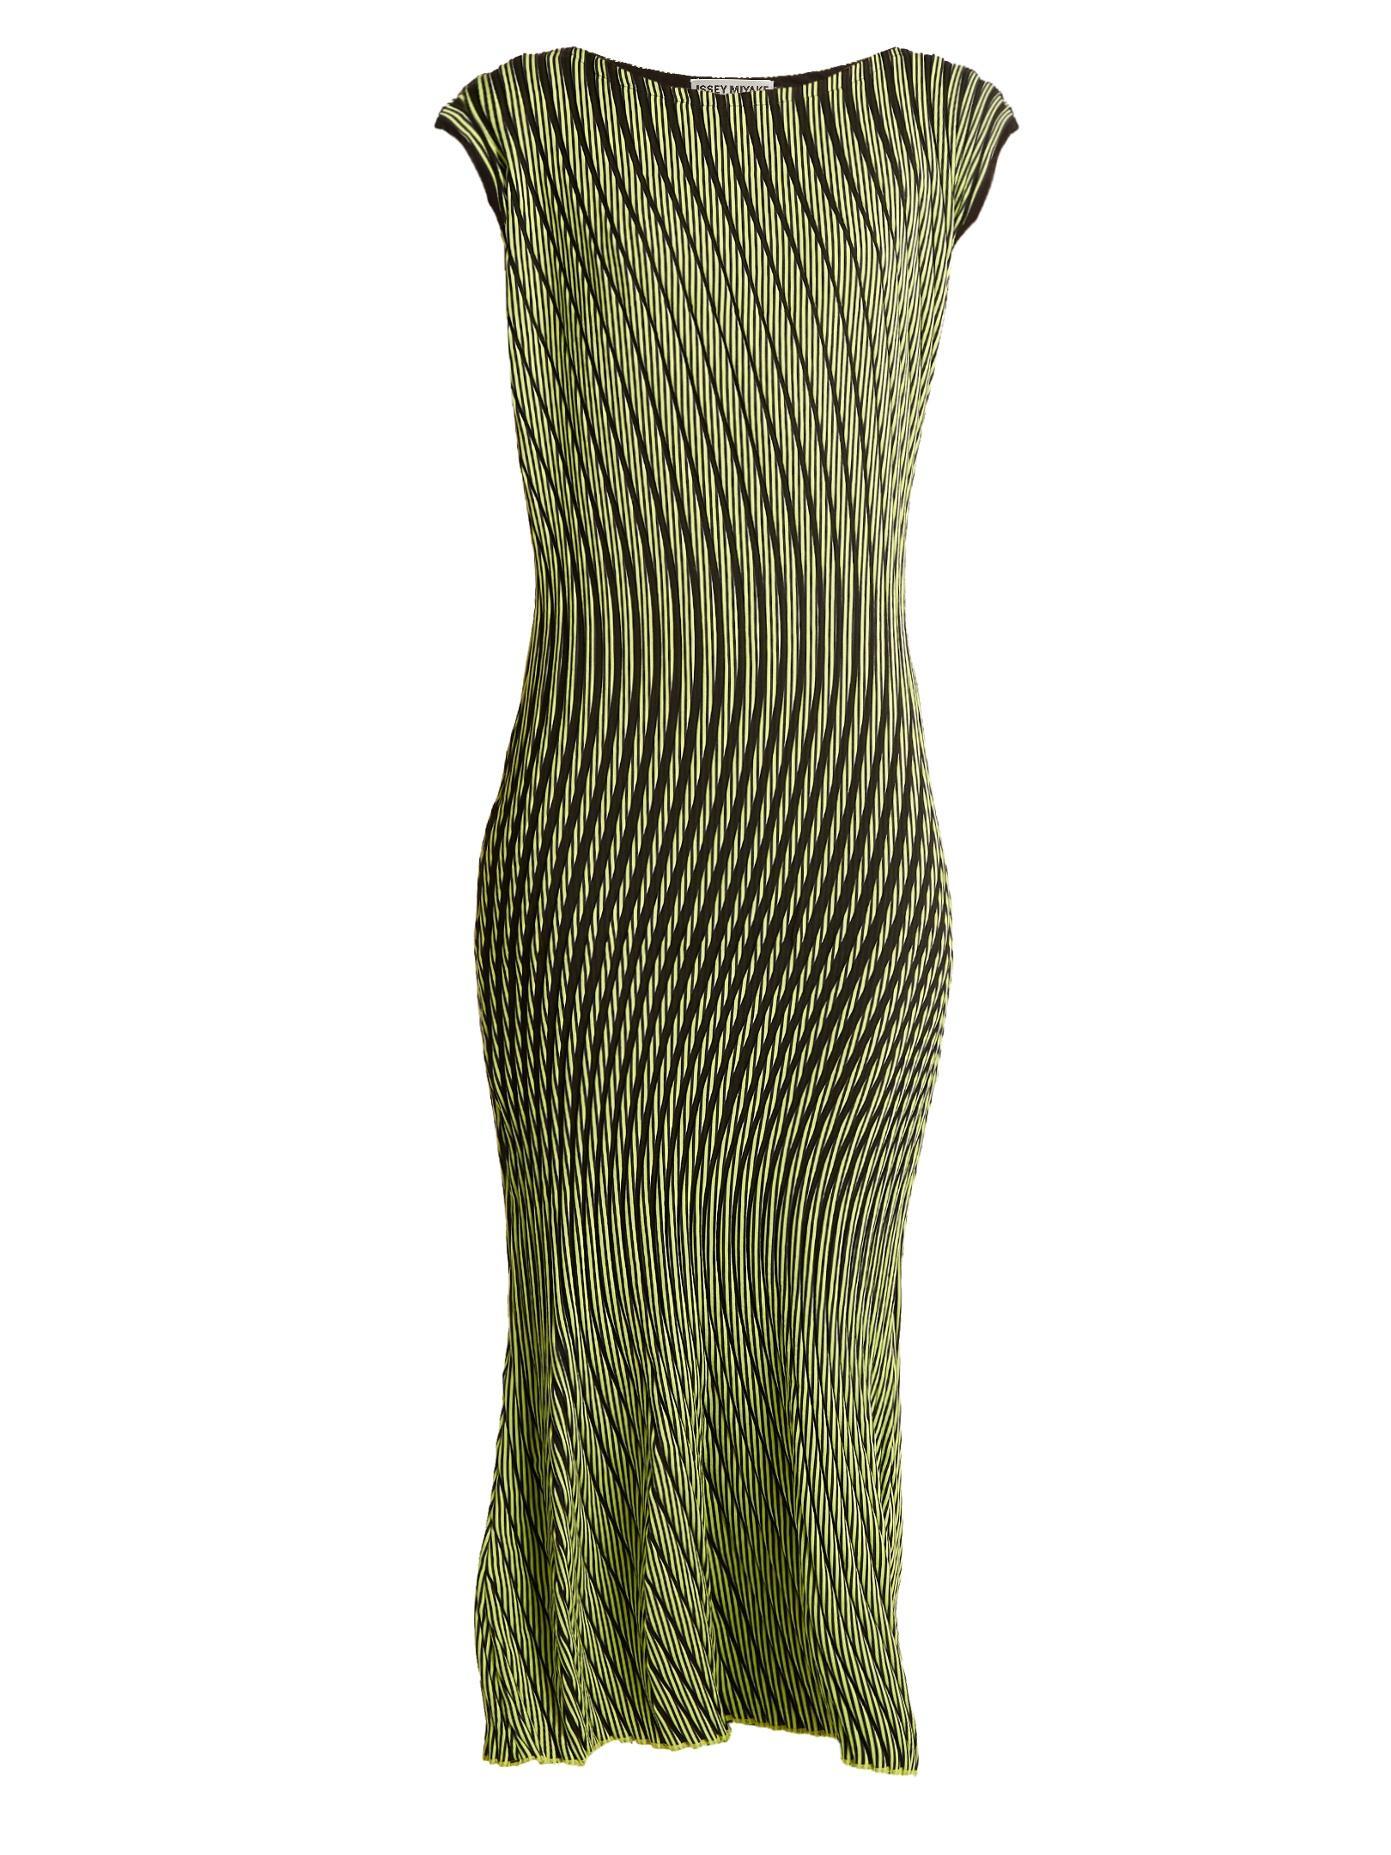 Issey Miyake Plasma 1 Waved Stripe-Pleated Midi Dress In Yellow Navy